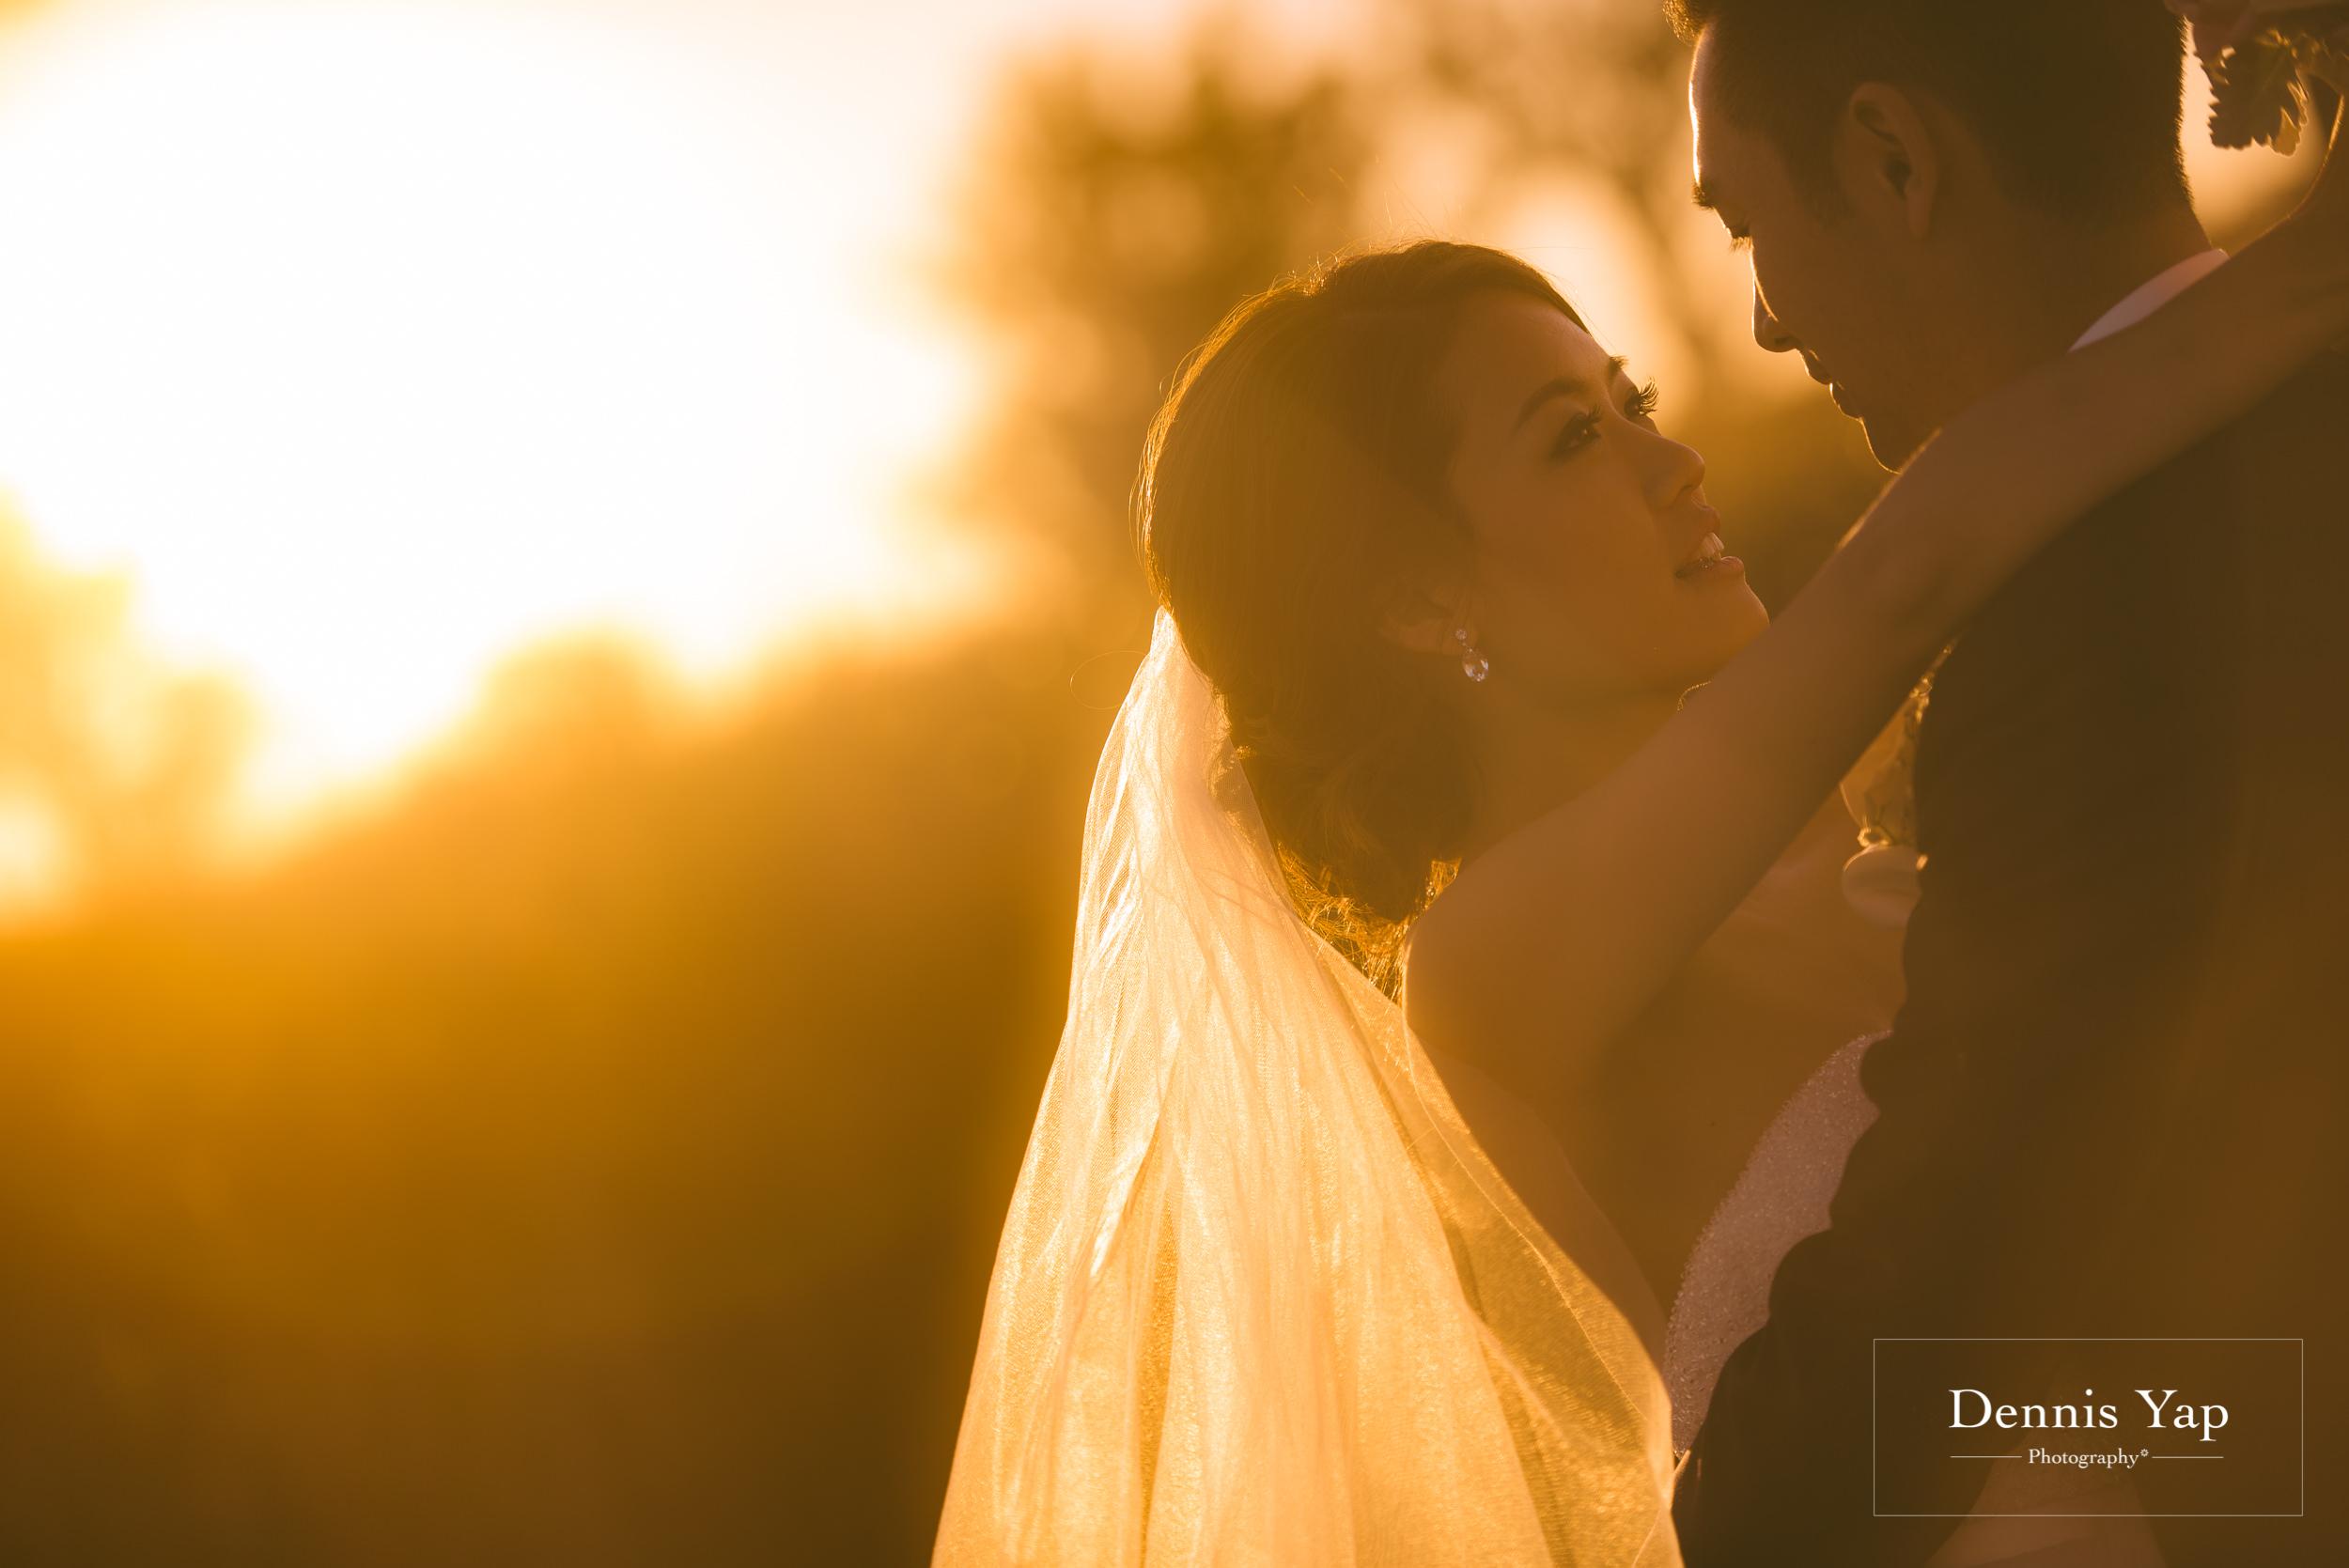 thang veng vietnamese wedding brisbane dennis yap photography malaysia wedding photographer-33.jpg